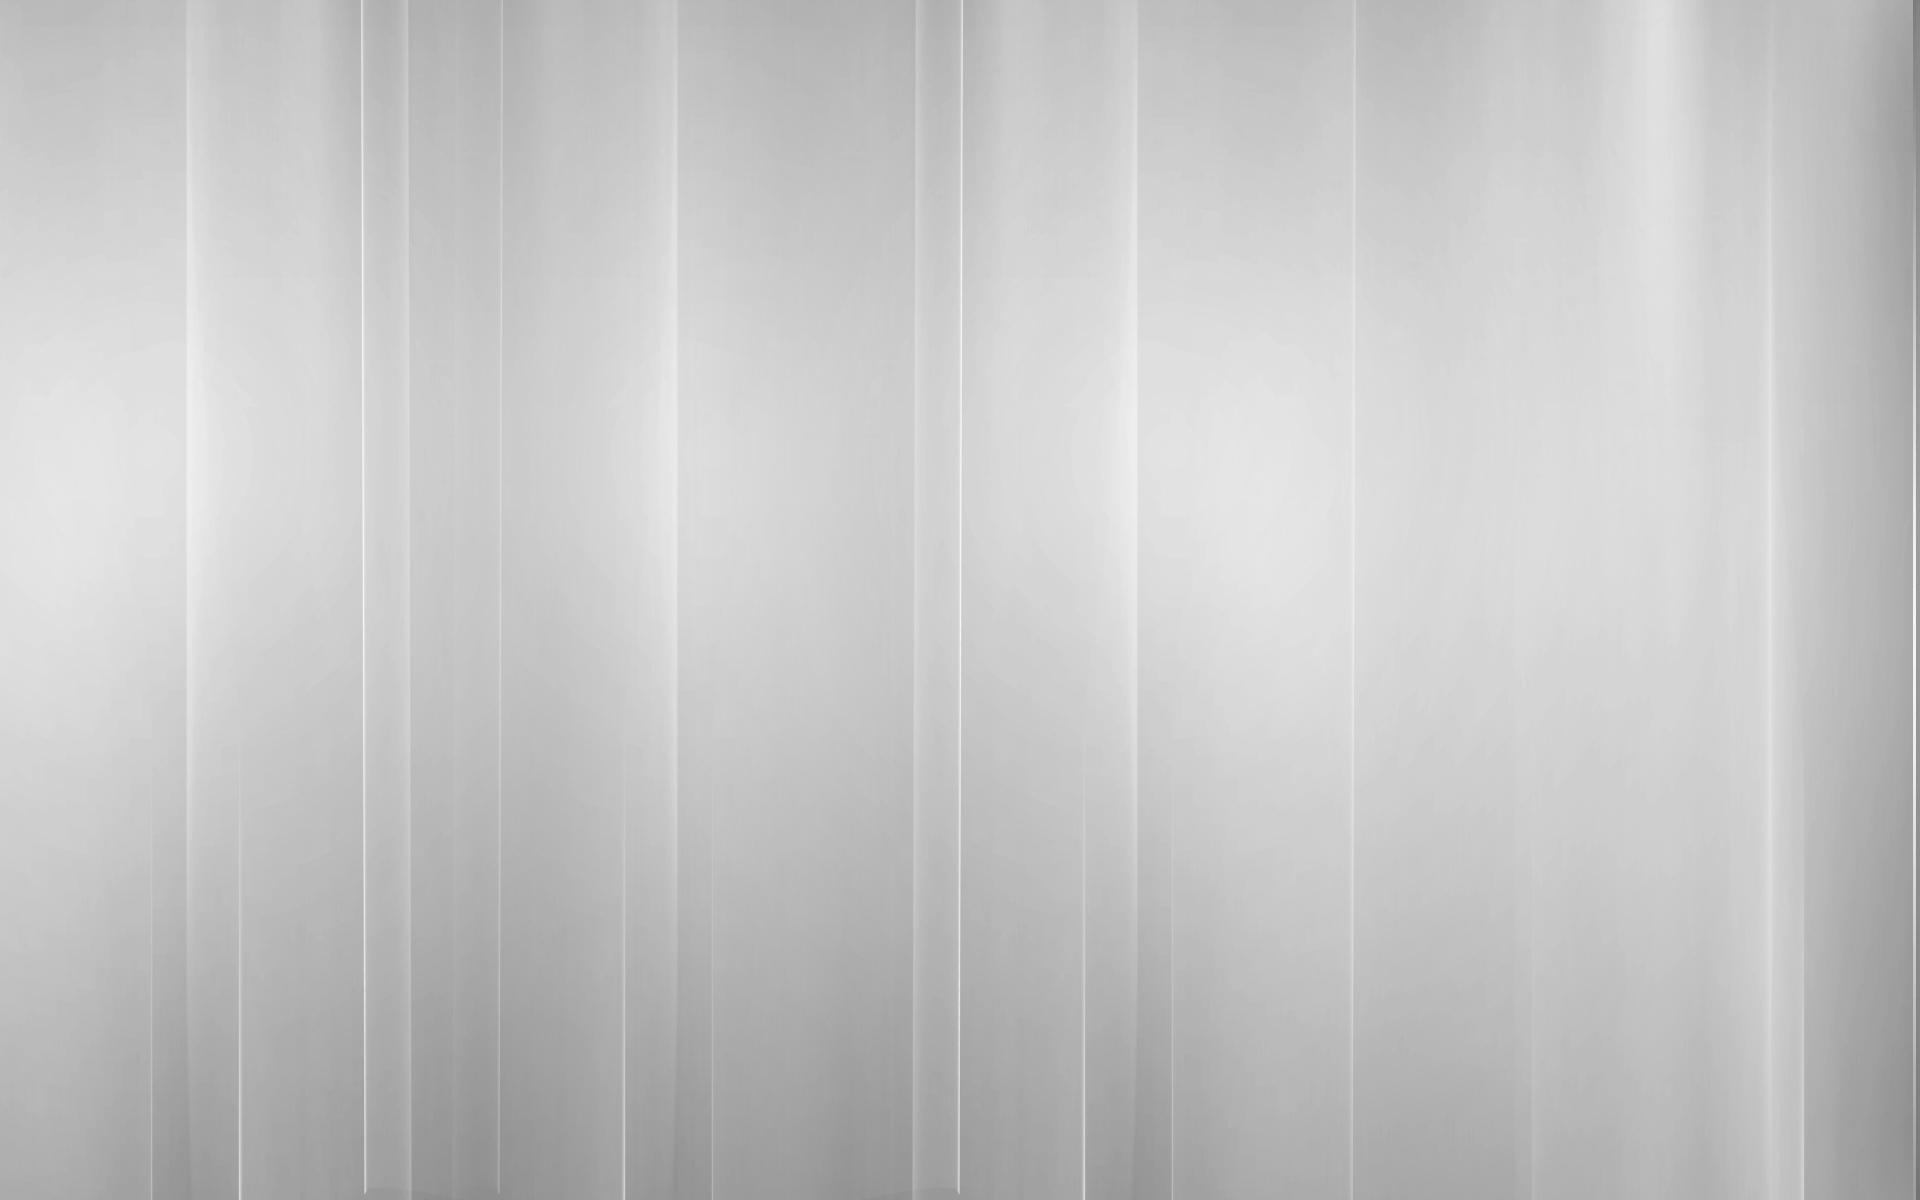 Hd wallpaper white - Shades Of Grey Wallpaper 88465